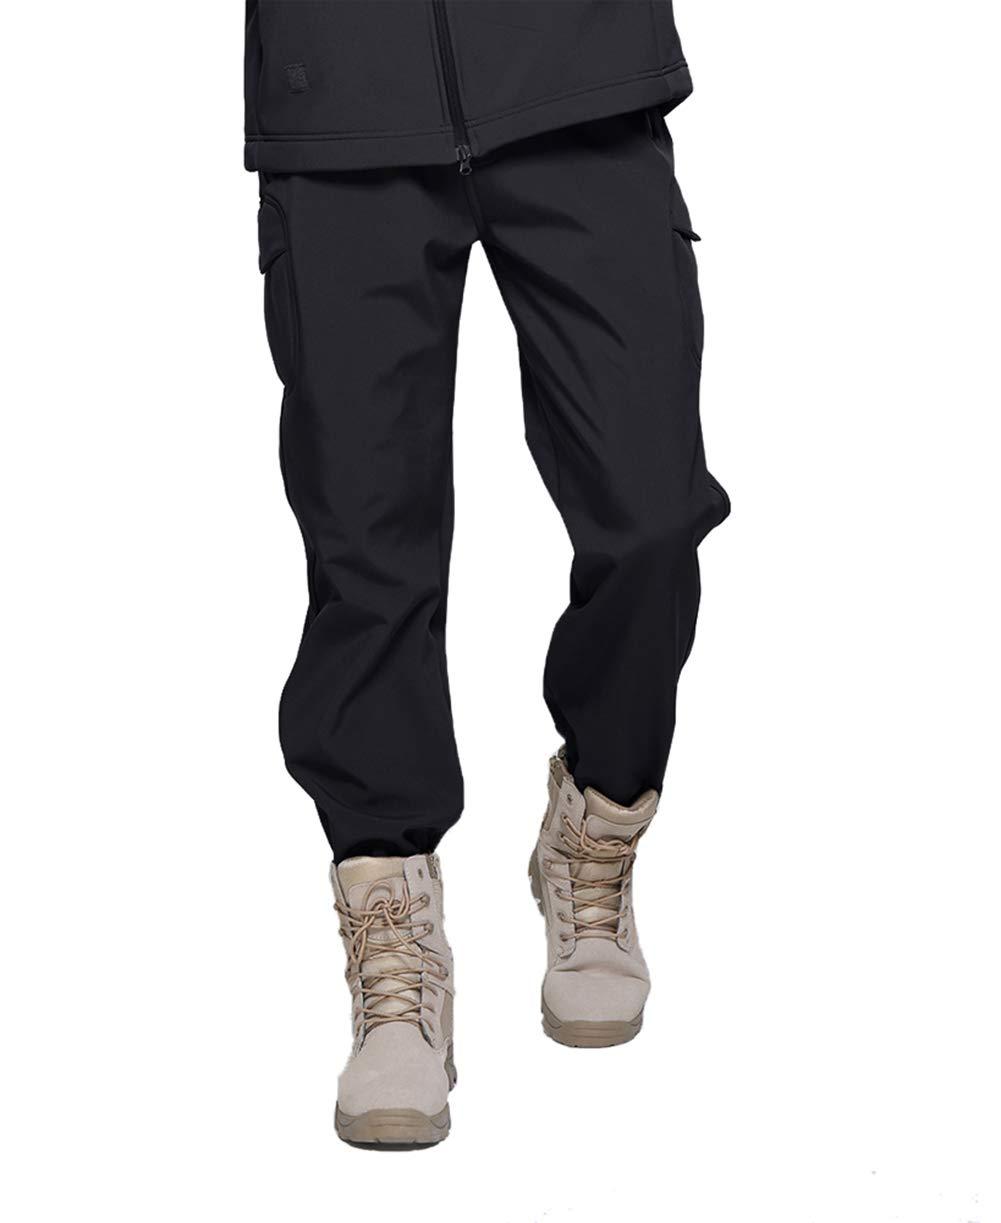 TACVASEN Herren Tactical Military Hose Fleece Futter Softshell Hose